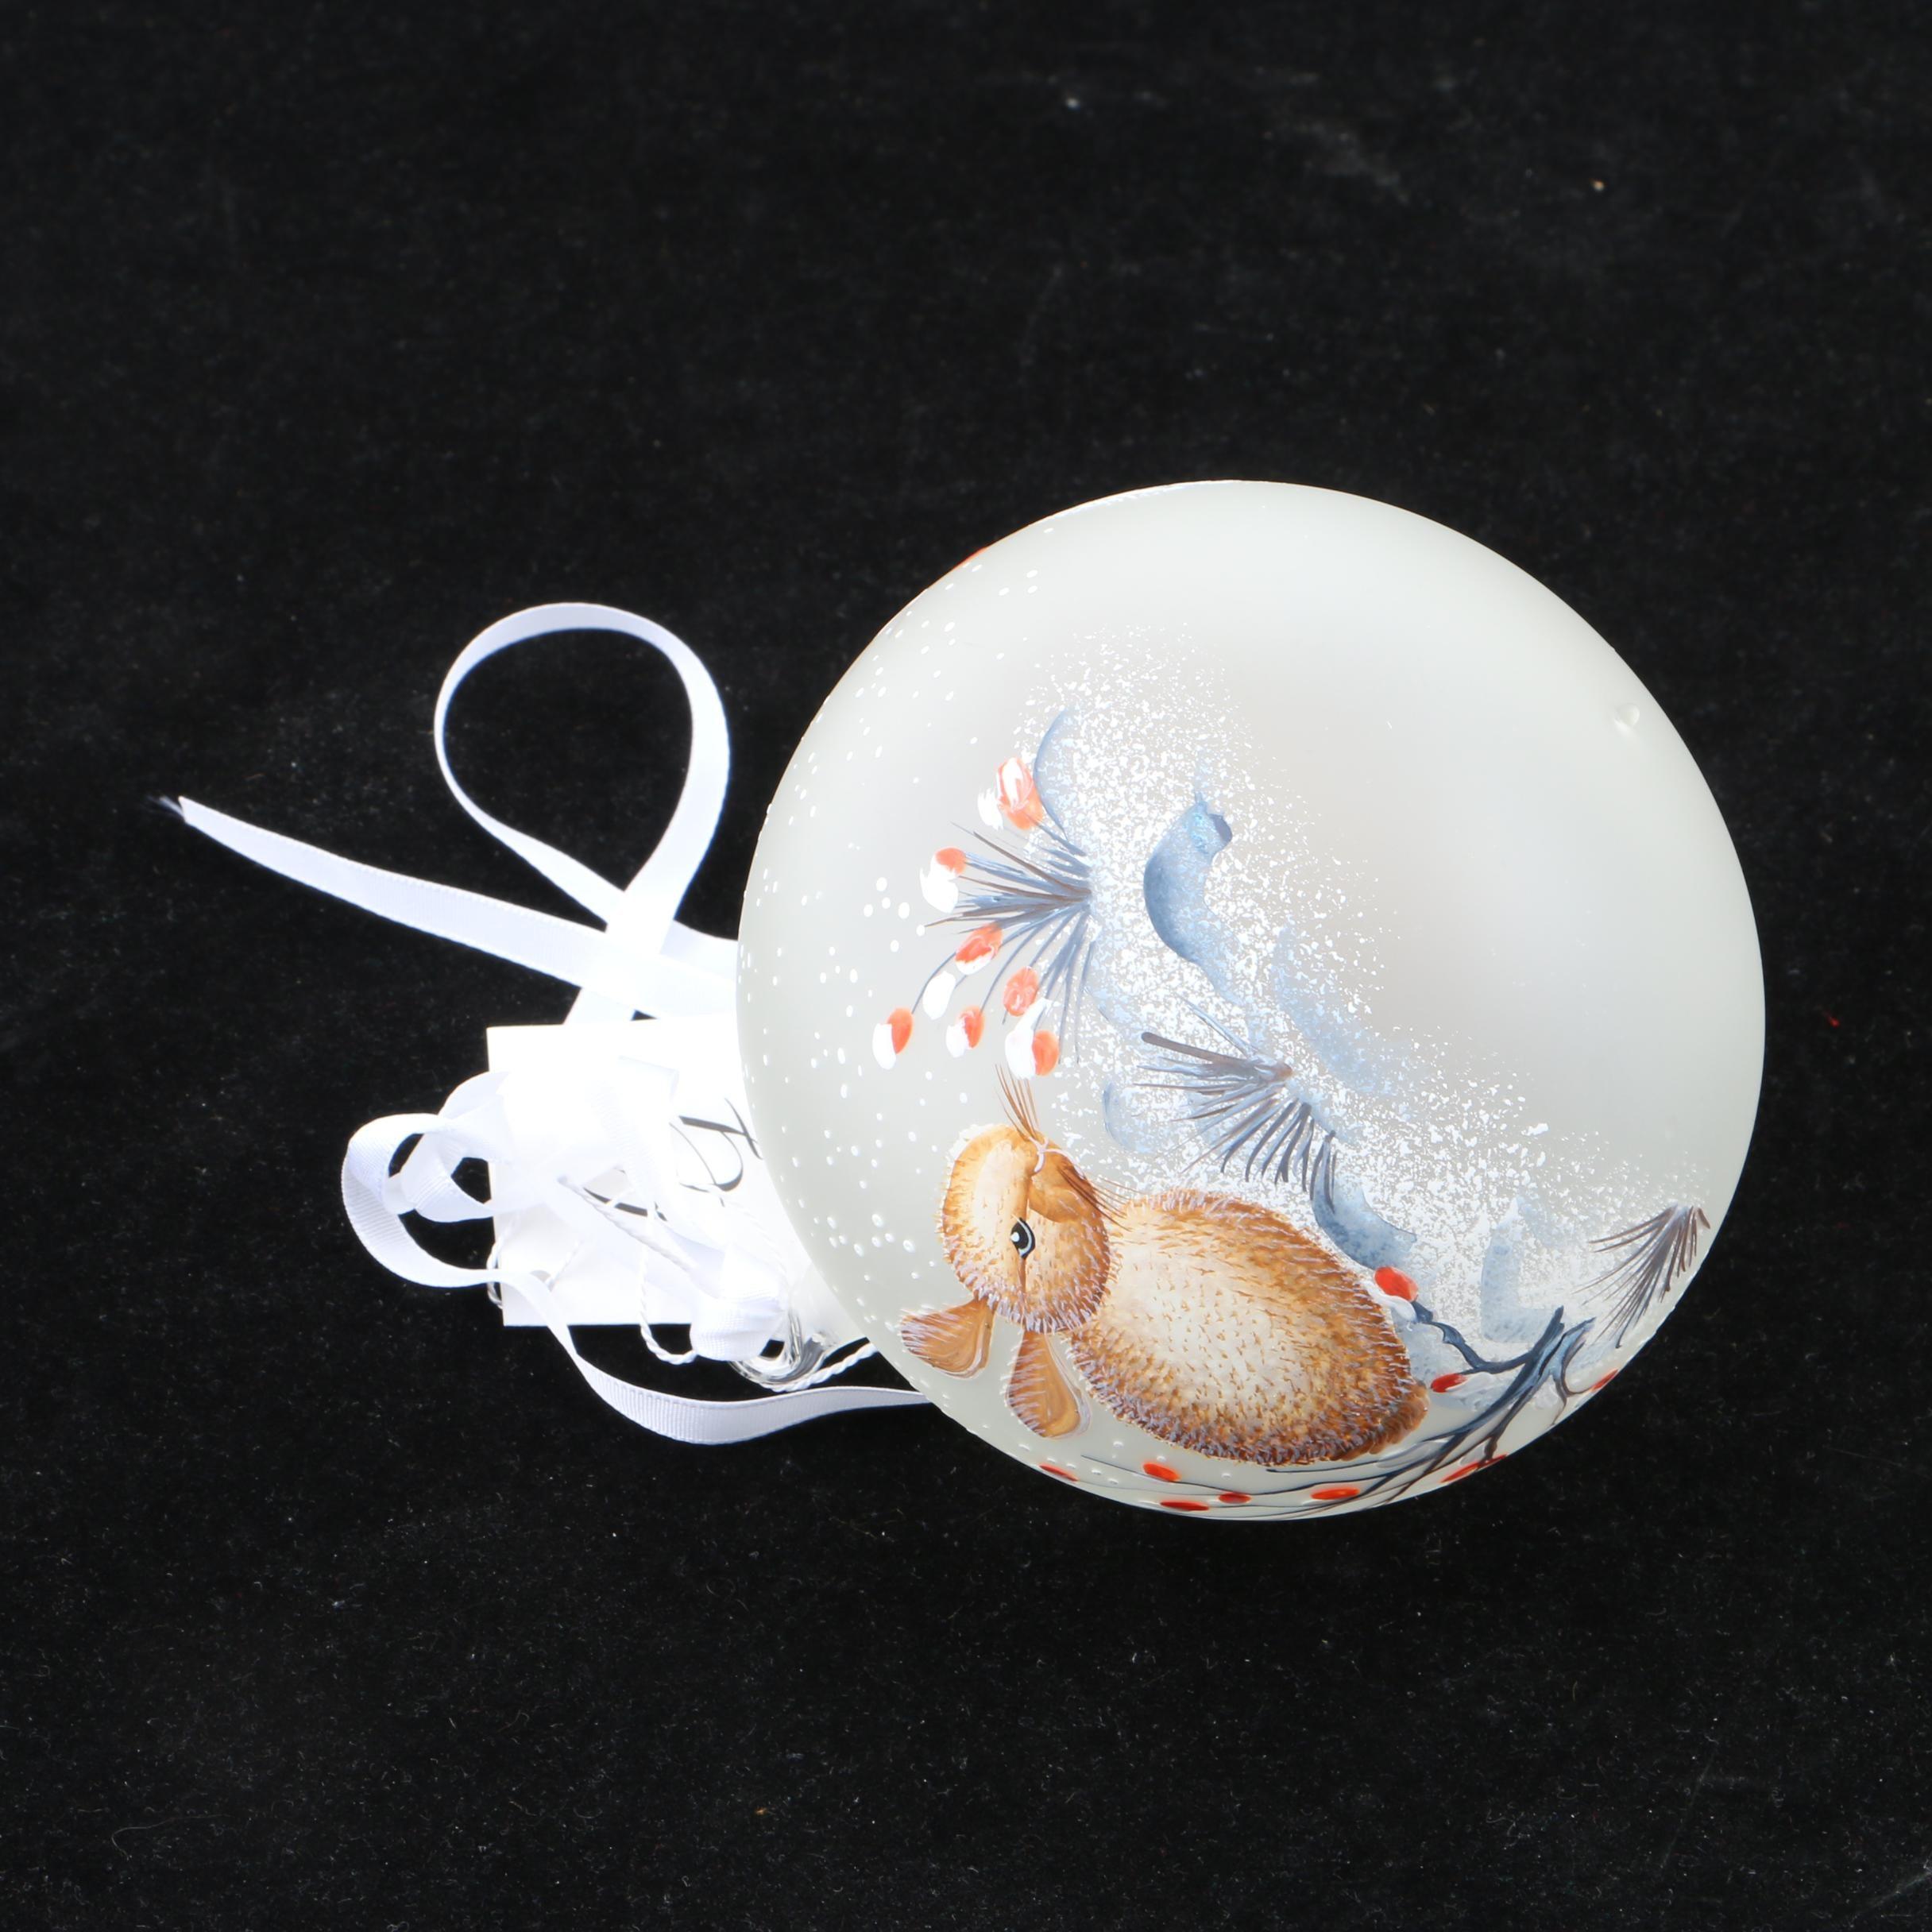 RG Glass Christmas Ornament with Rabbit